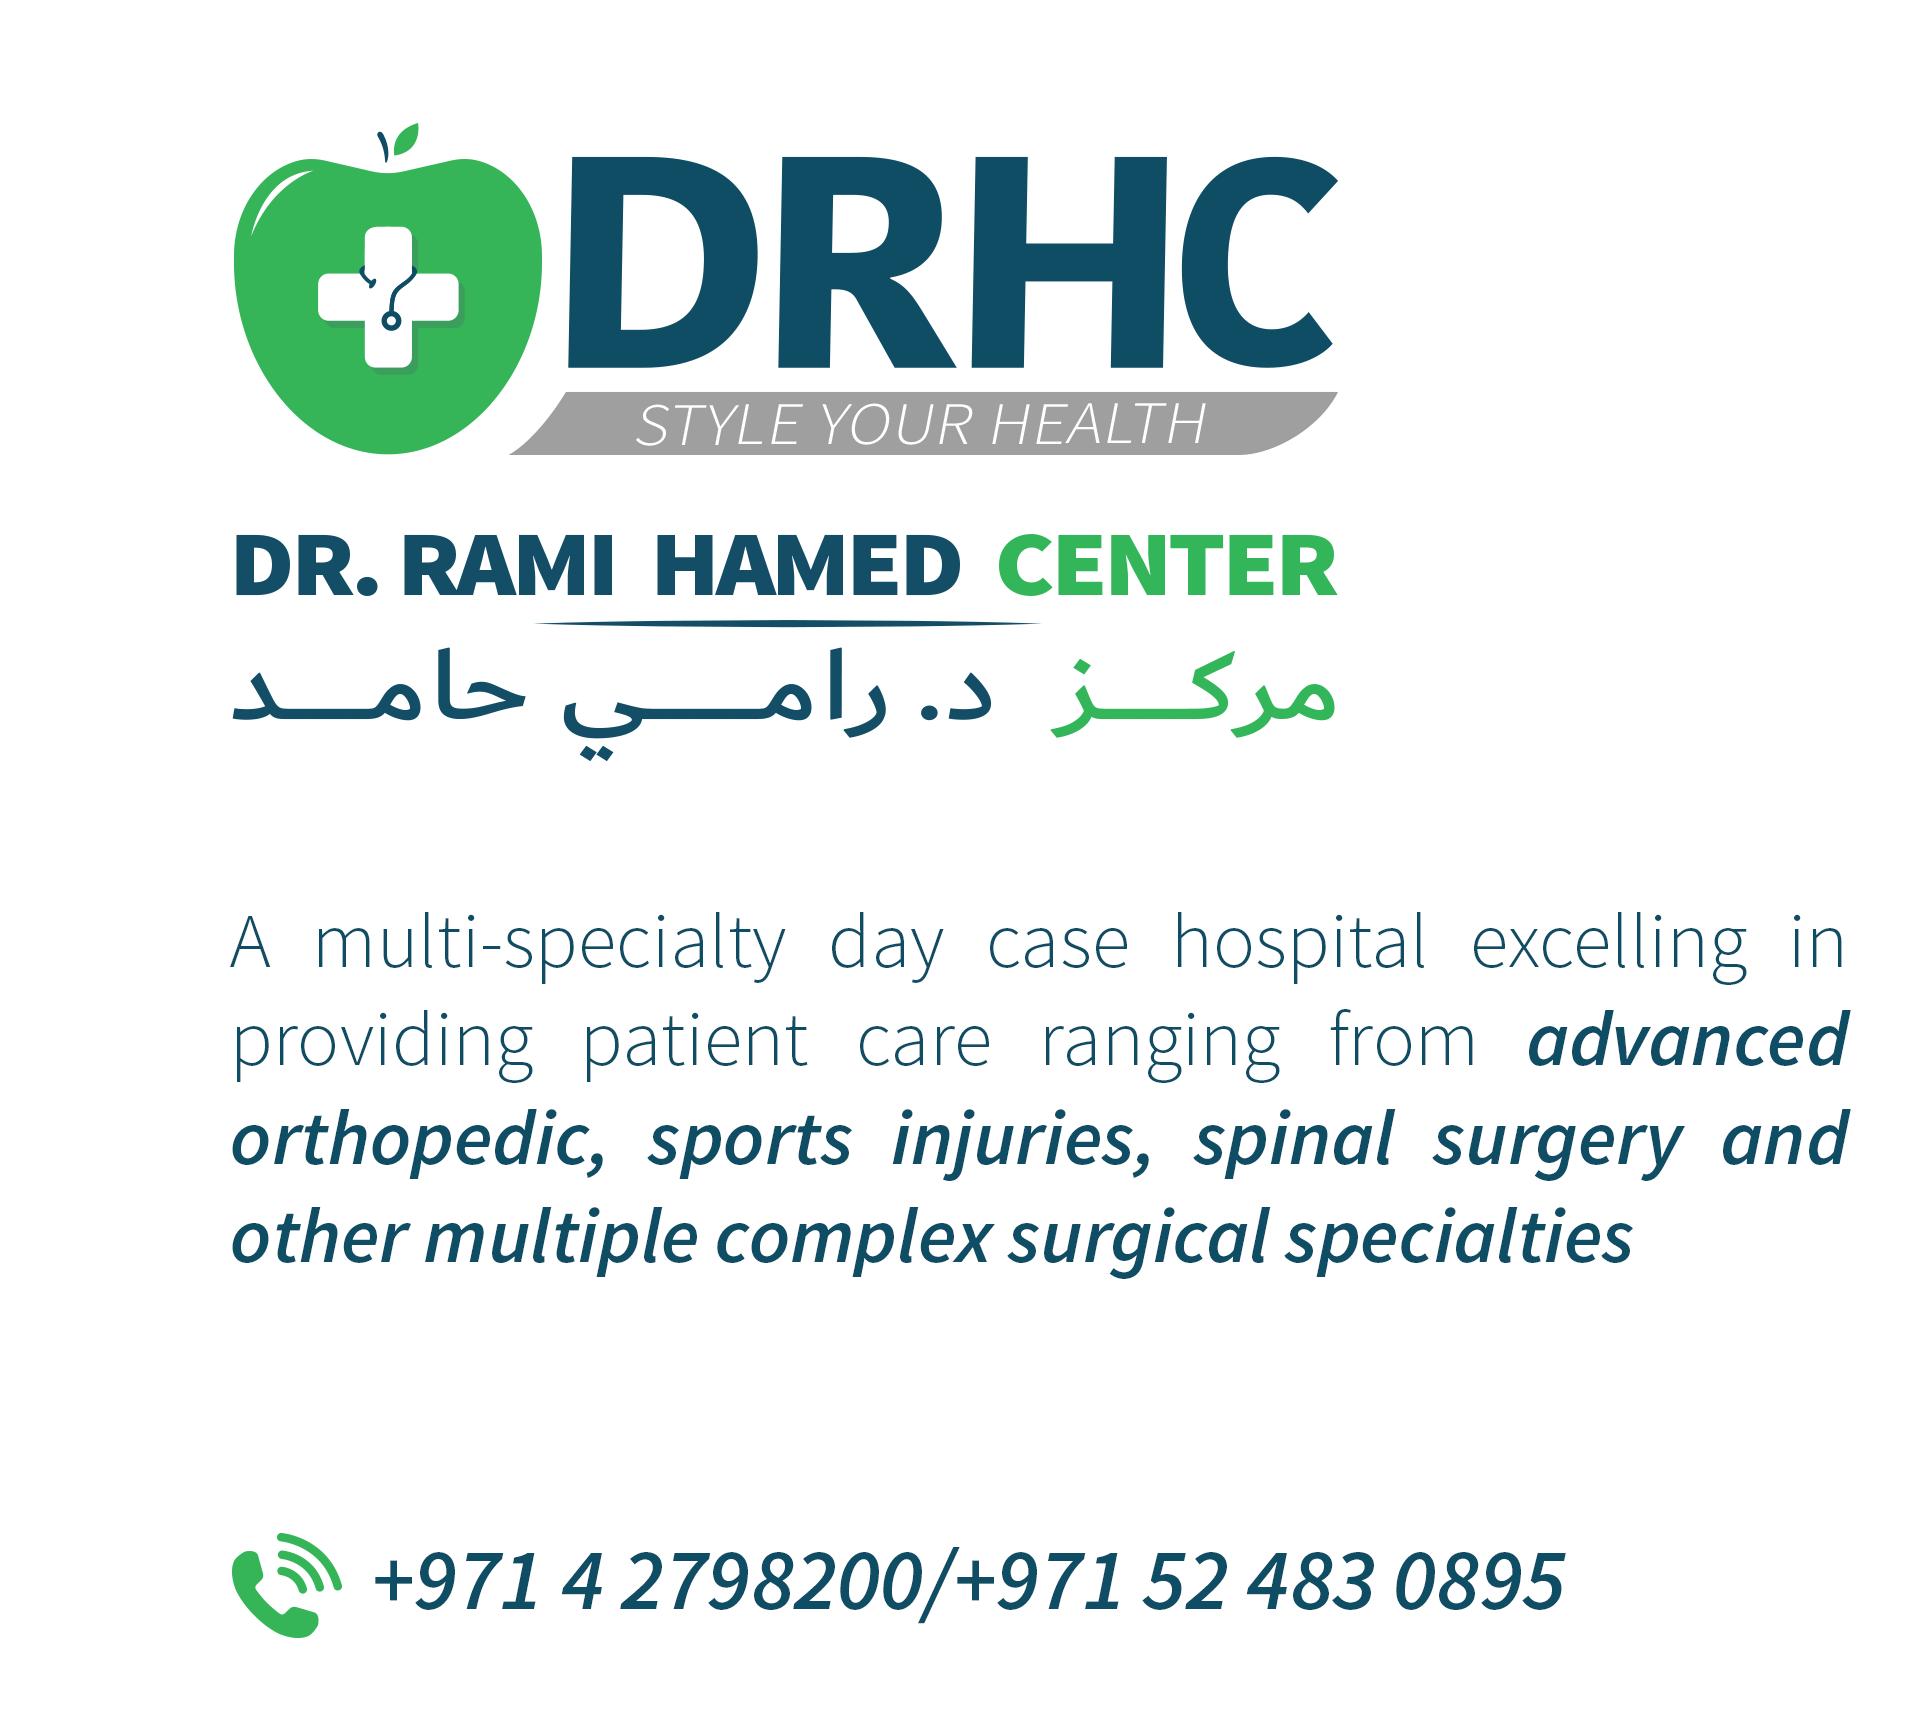 Dr Rami Hamed Center Dubai - Day case surgery hospital-1